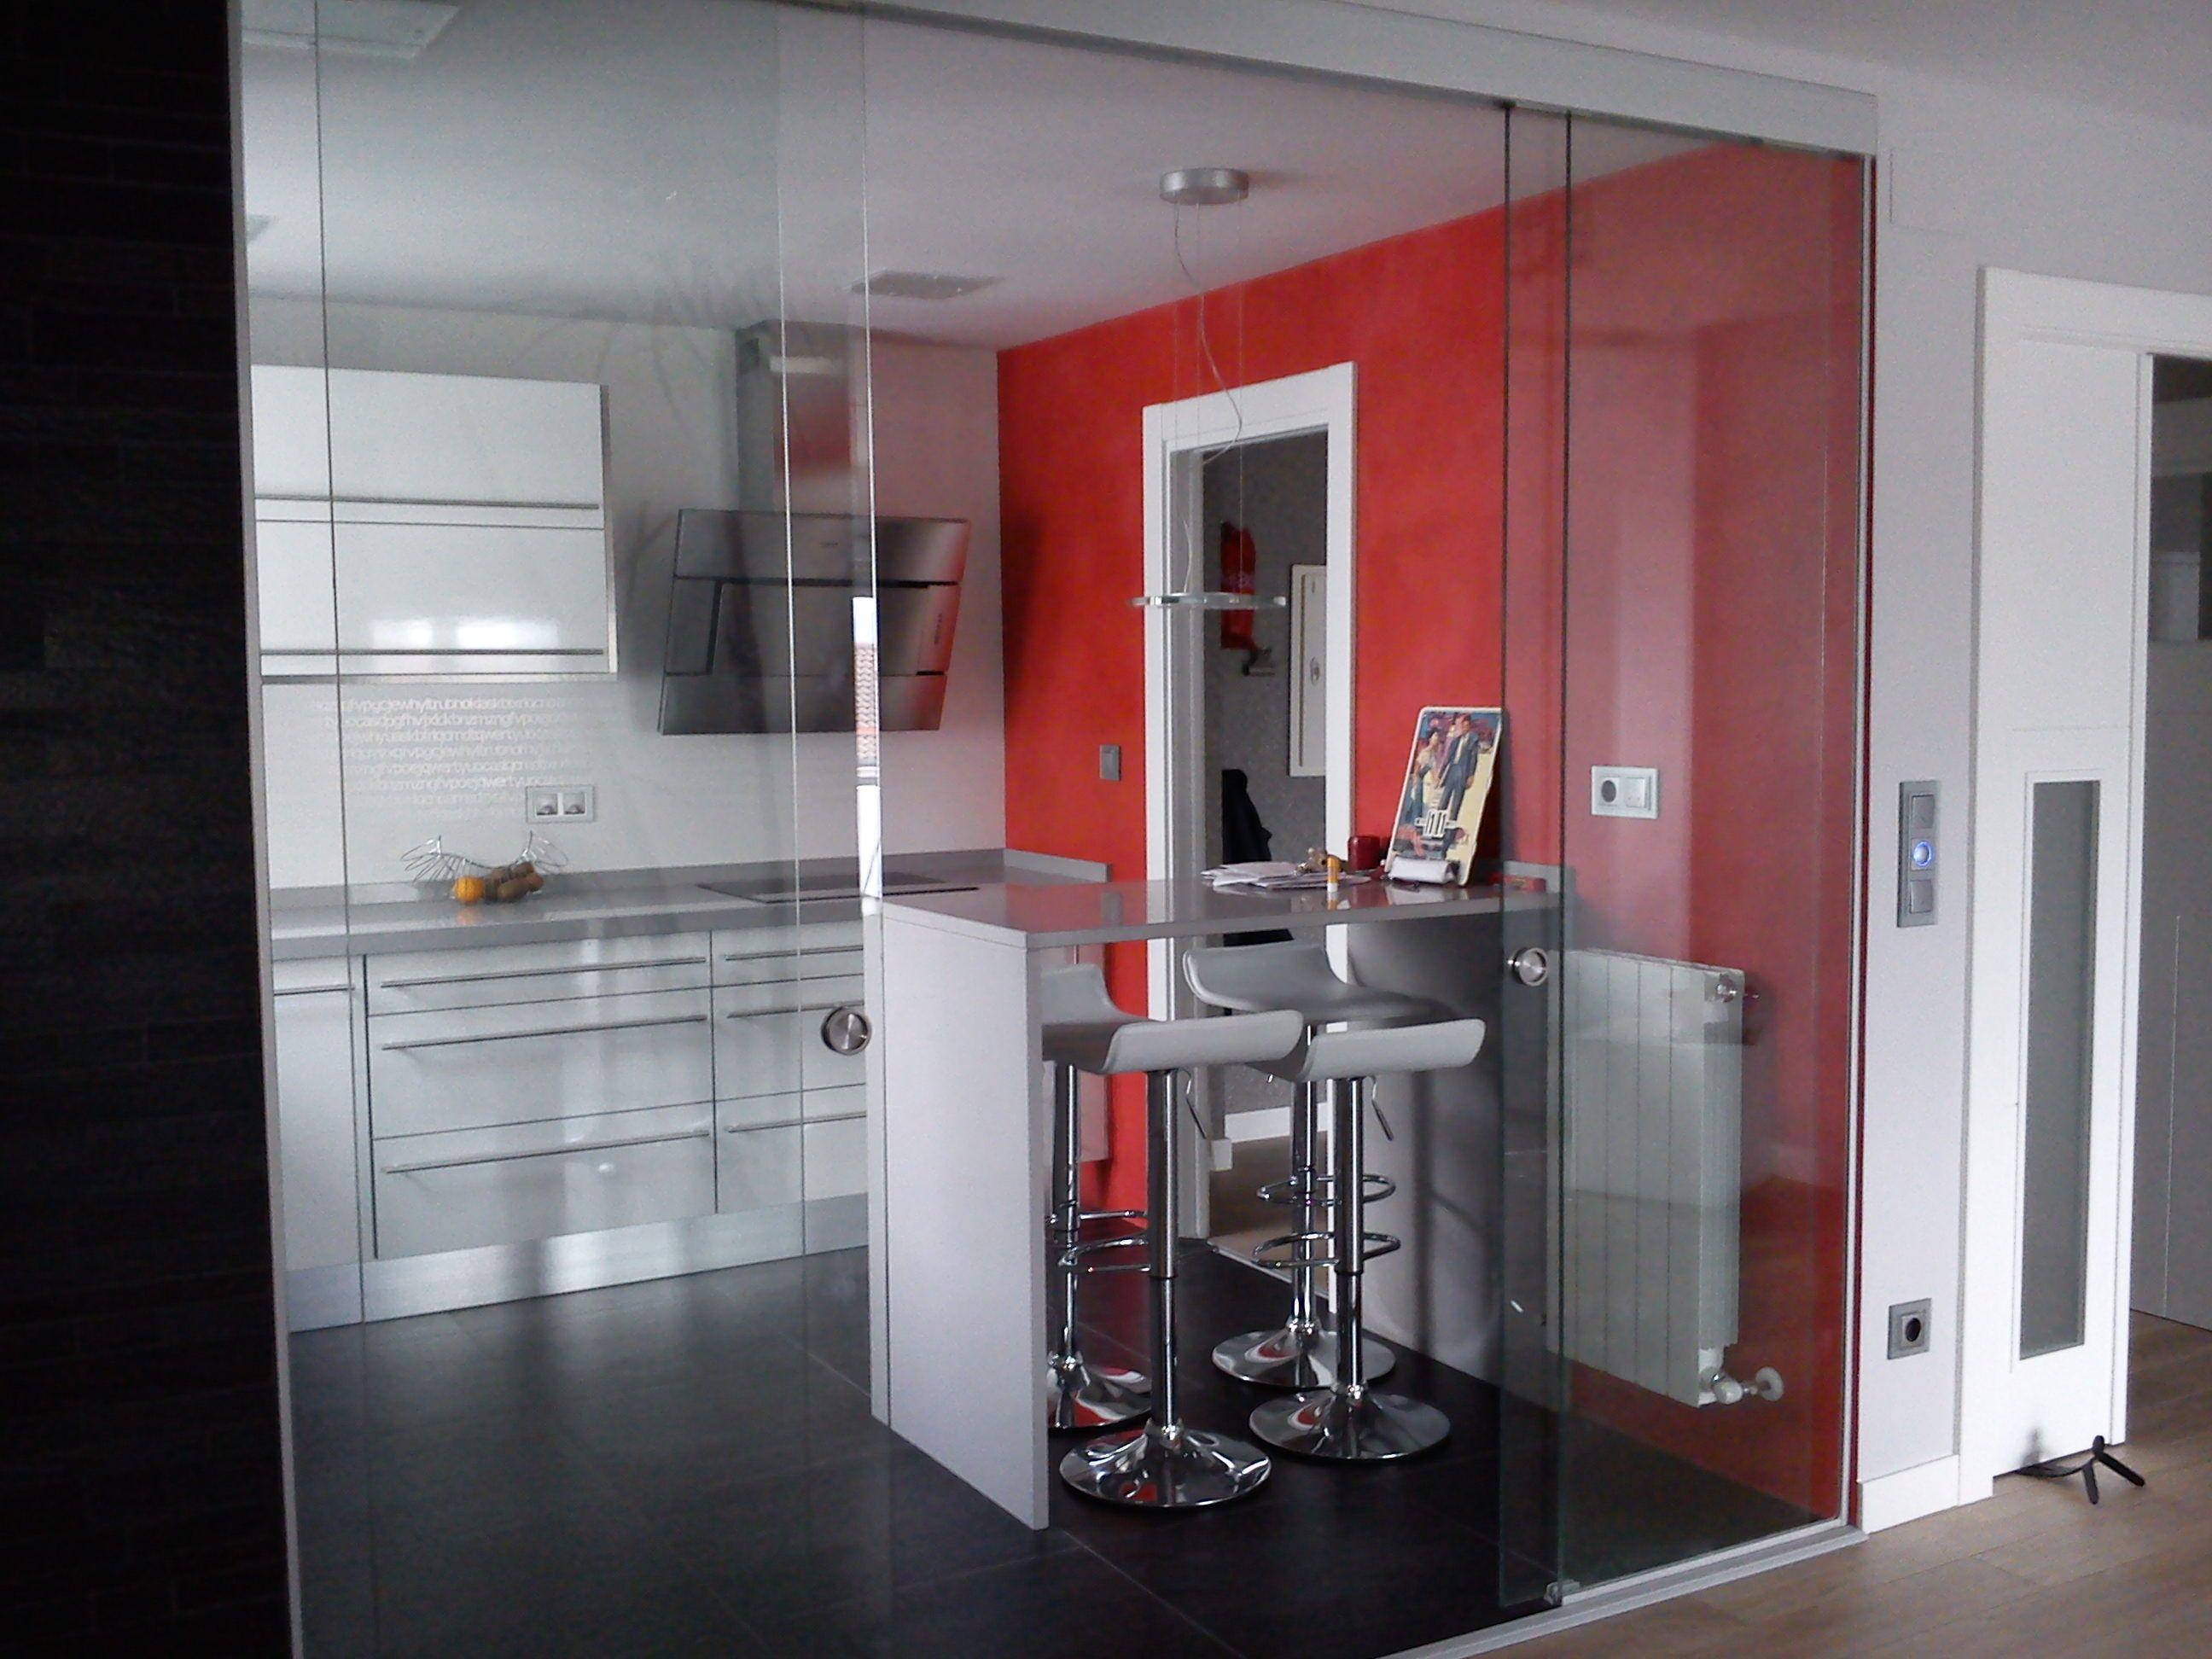 Cocina Roja Con Mampara De Cristal Decoraci N Pinterest  ~ Cristales Decorados Para Cocinas